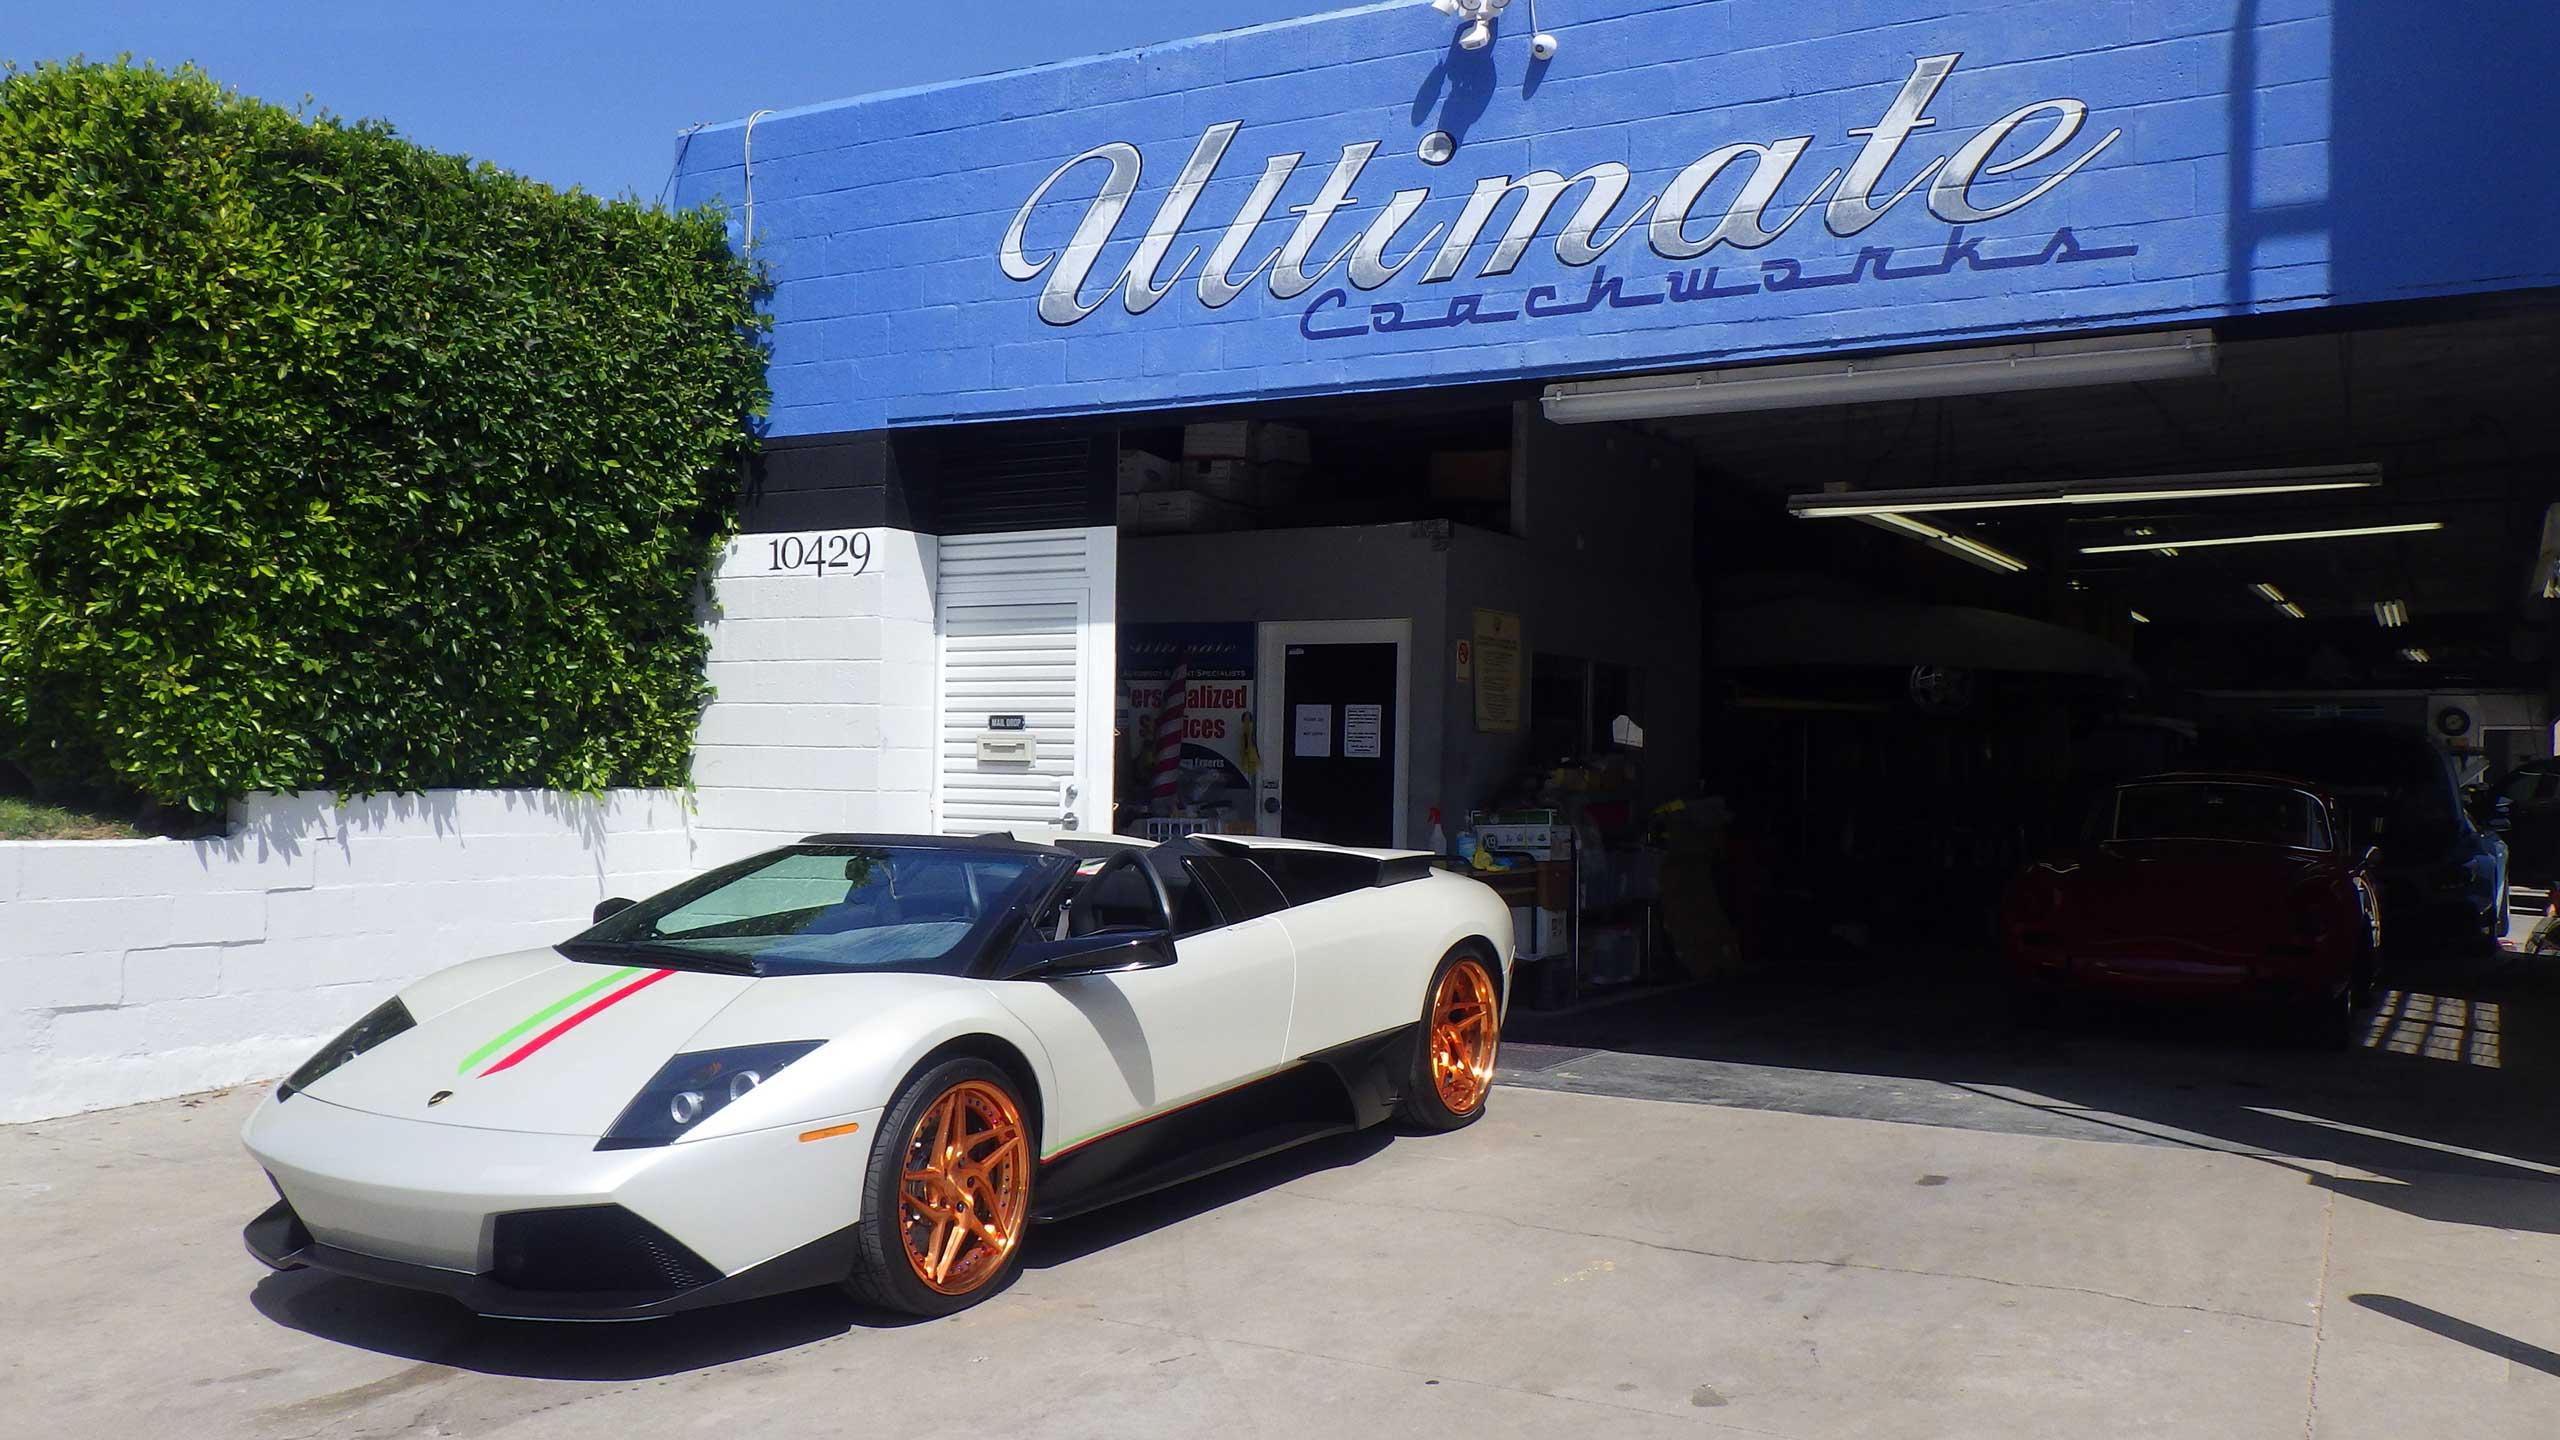 UC_1_car_side_storefront_2560x1440-002